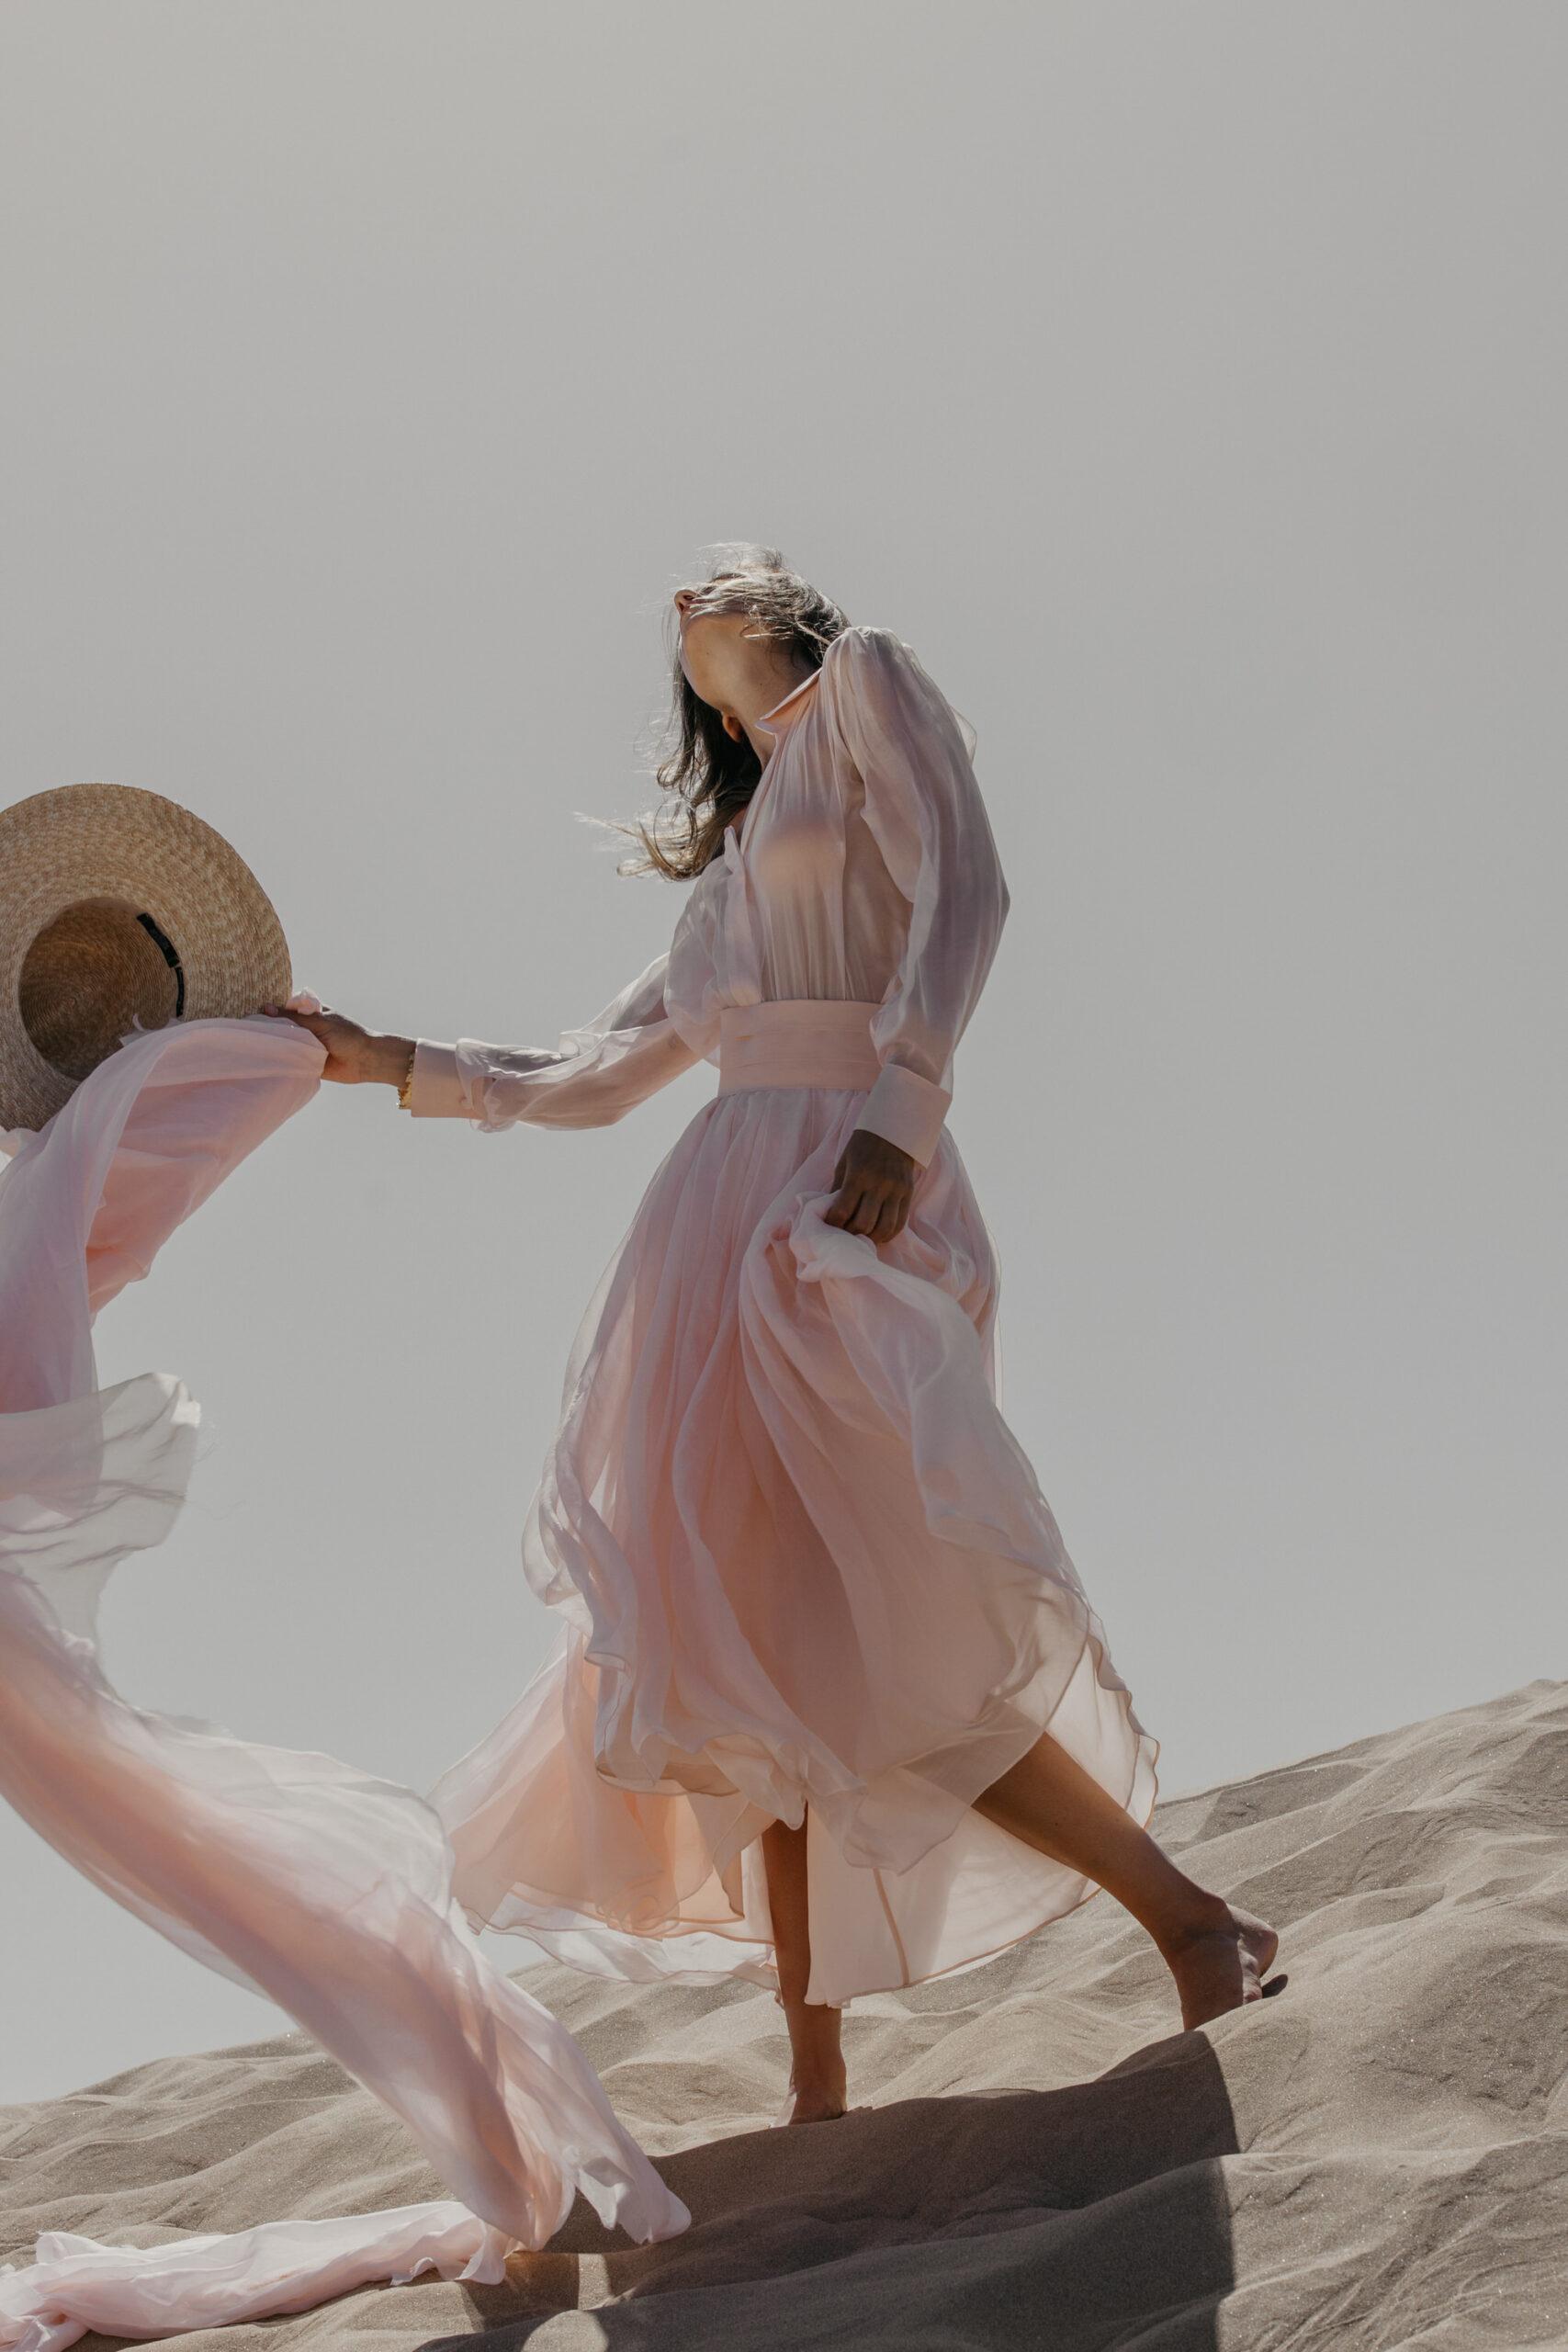 BAIE ROSE - Victoire Vermeulen